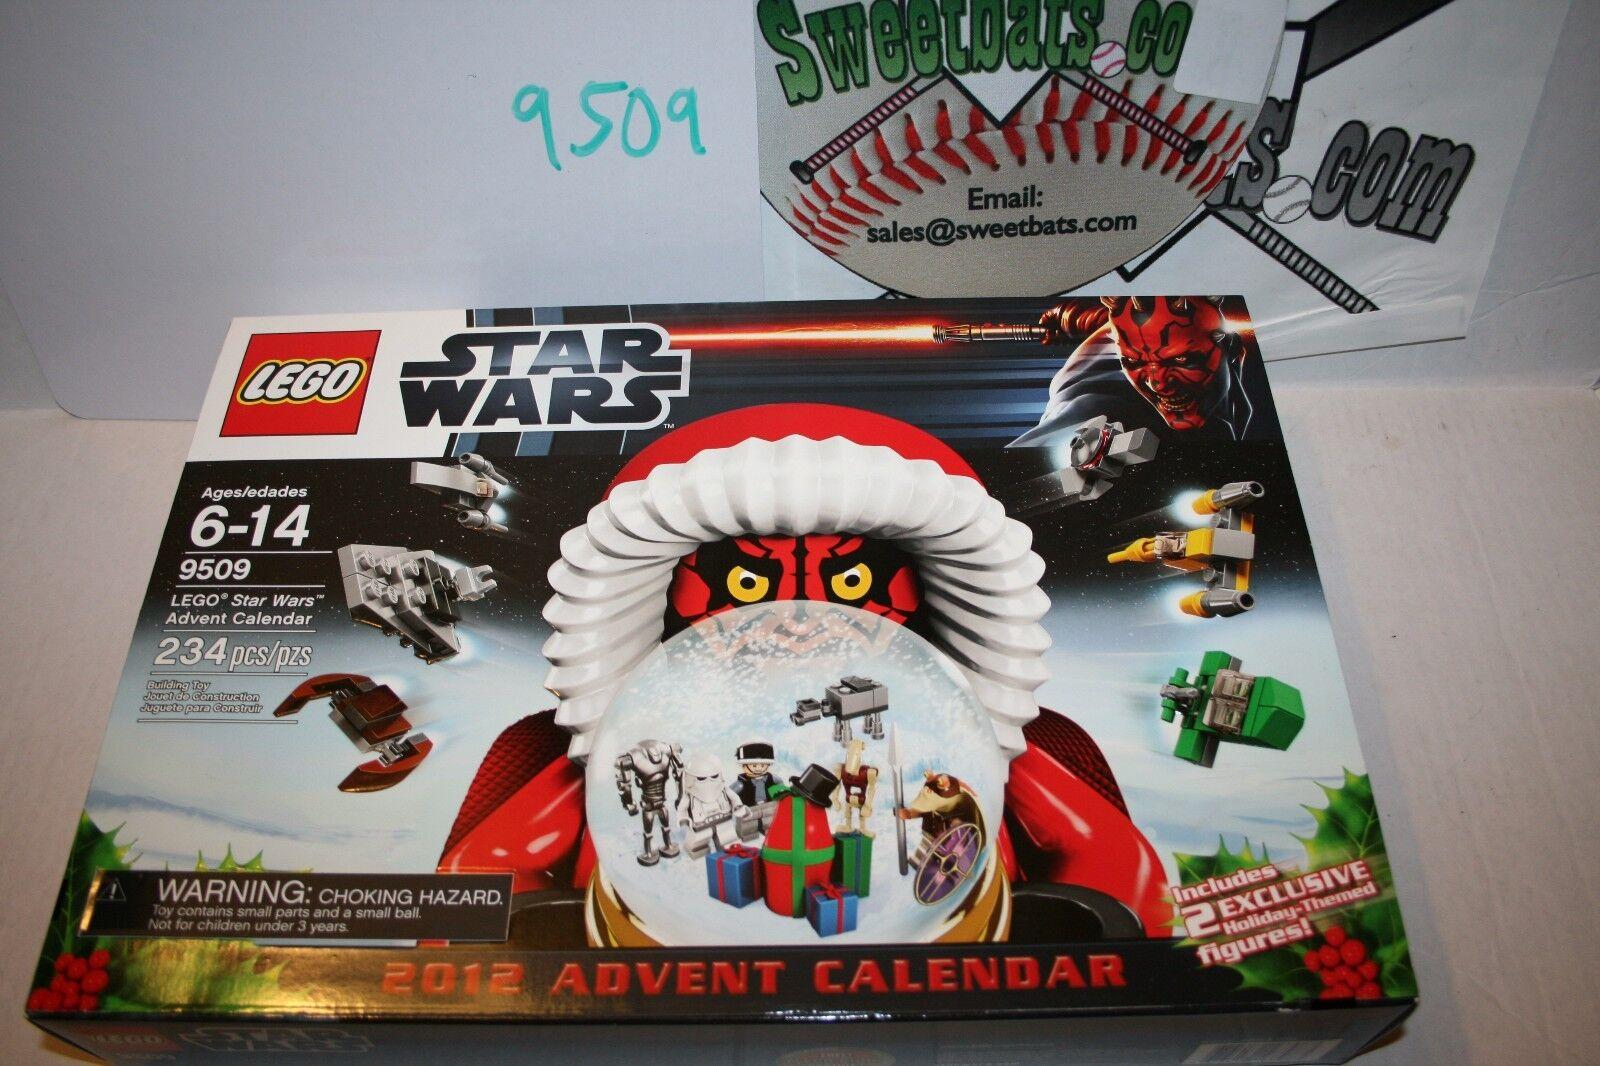 Lego Star Wars 9509 2012 ADVENT CALENDAR Neuf dans sa boîte NEW IN BOX retraité sold out Darth